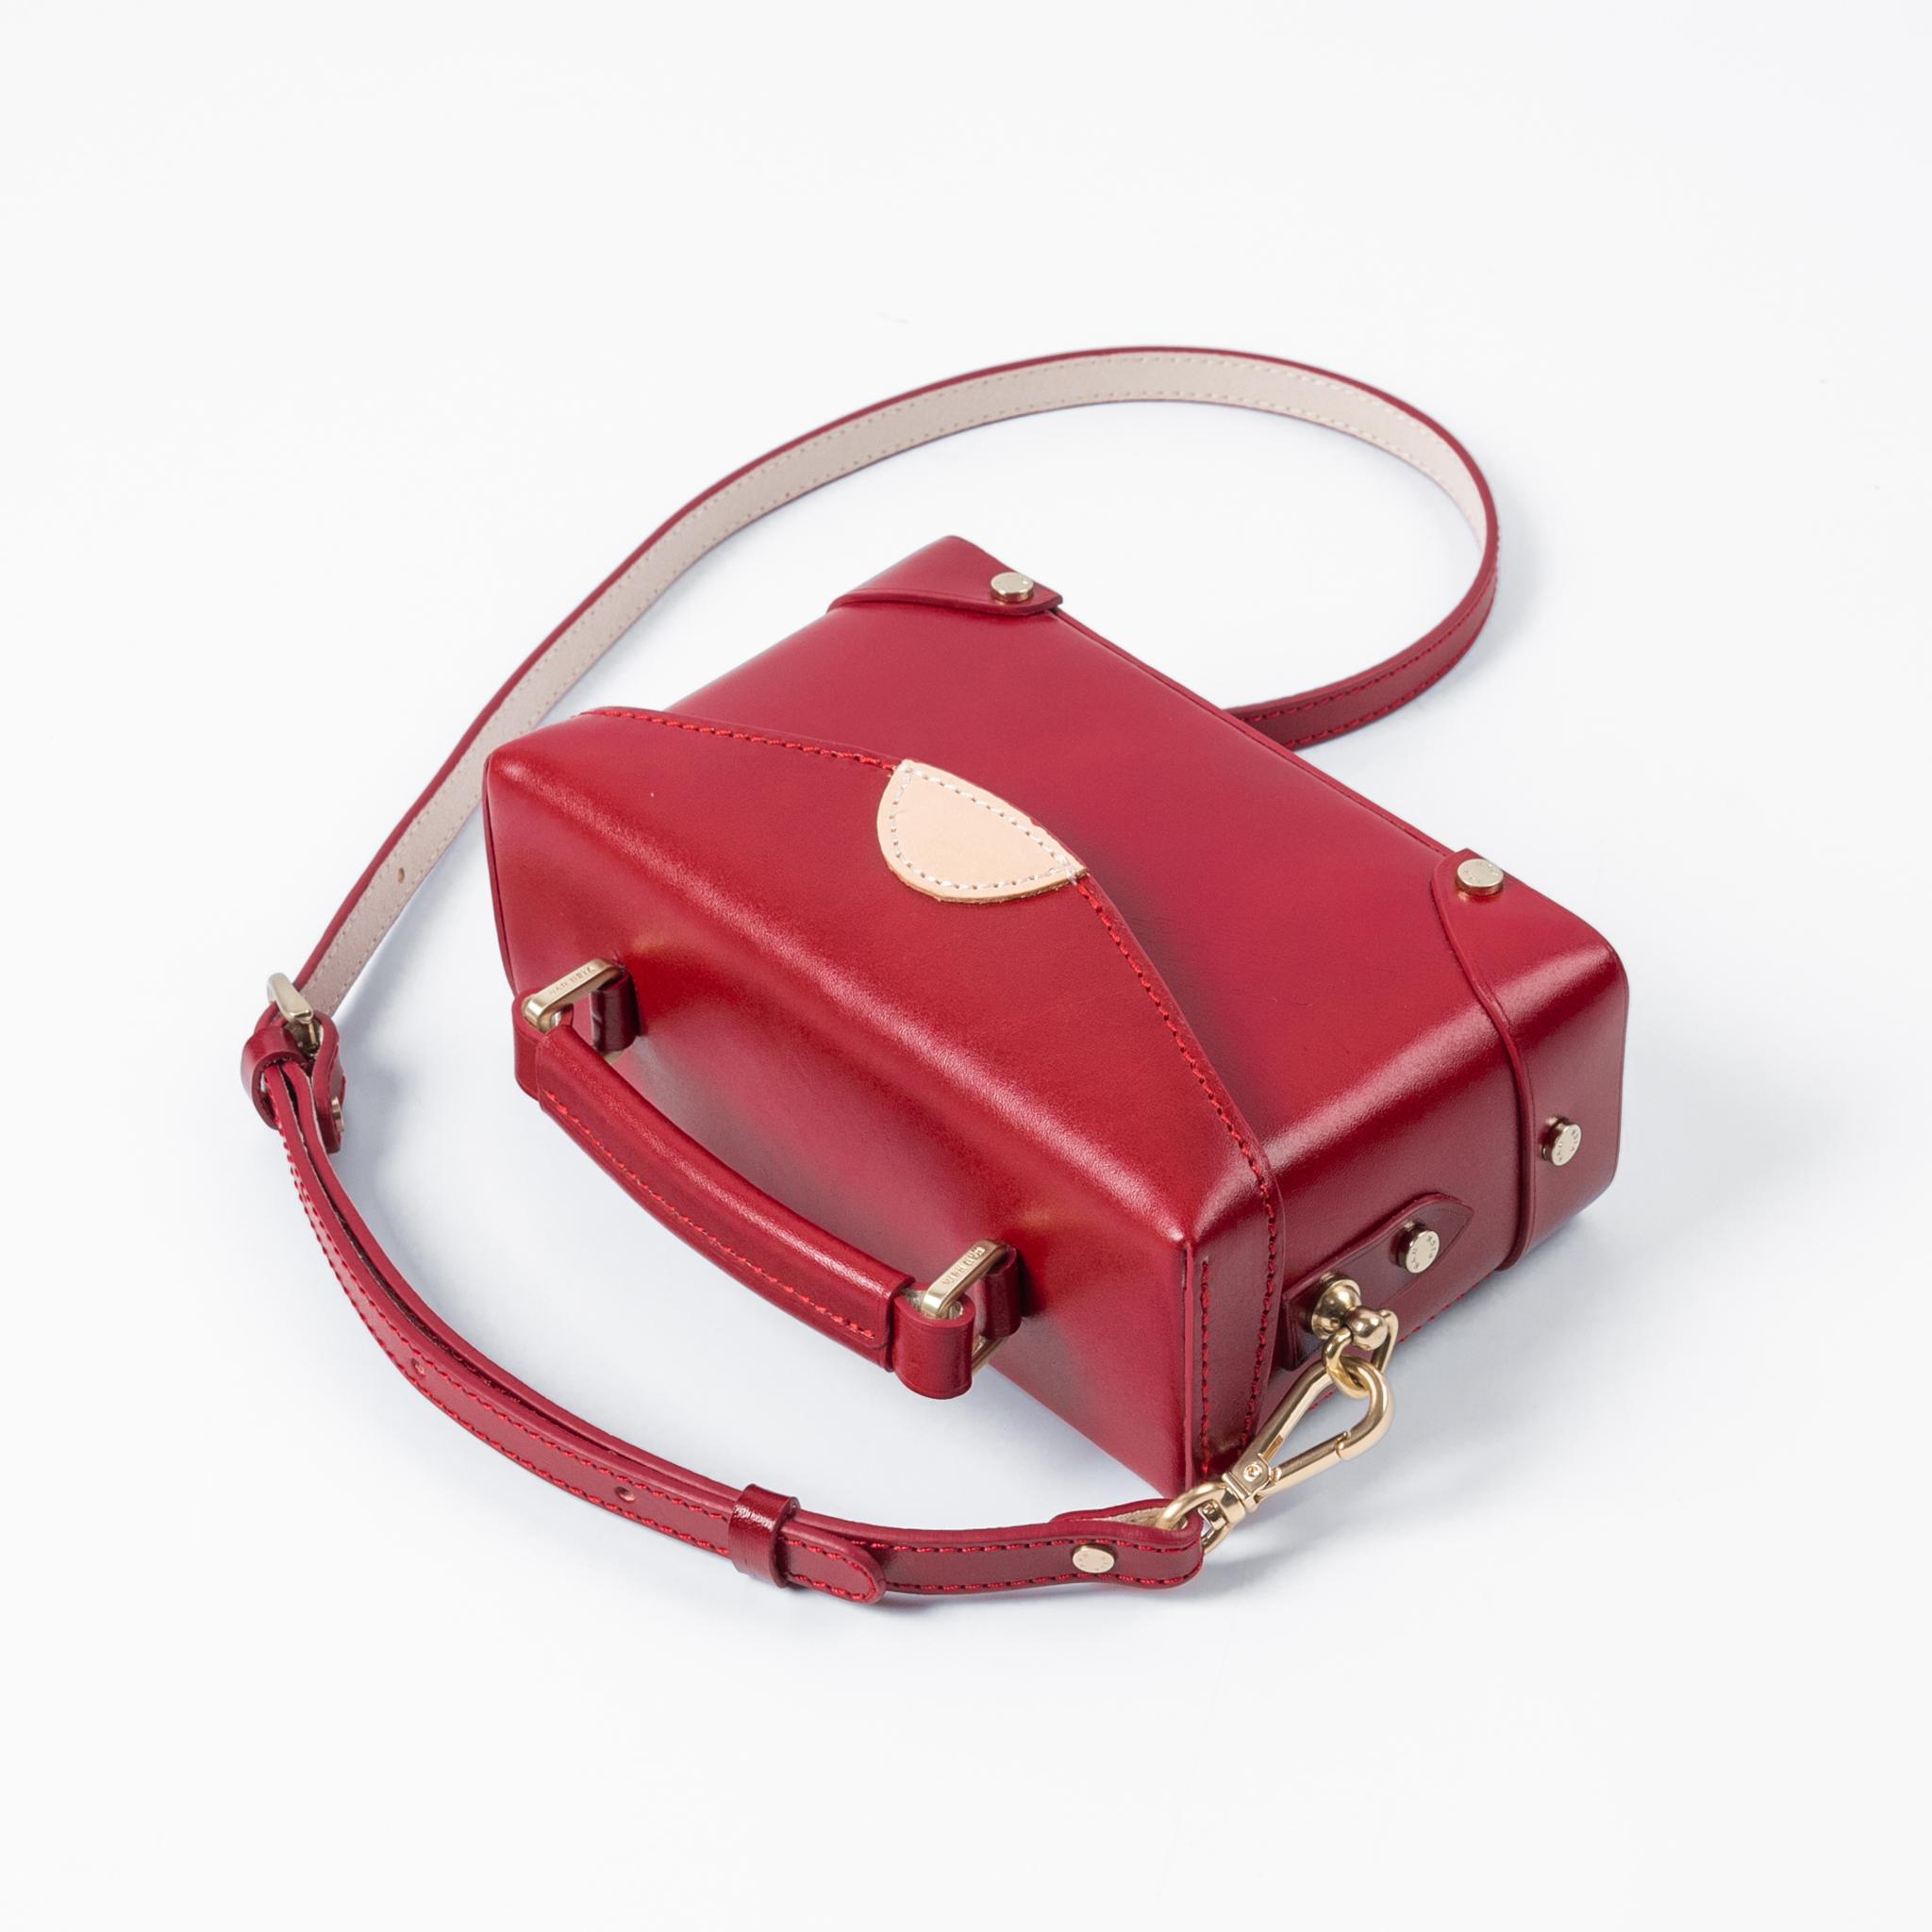 HANHSIA/函夏手工 酒红色小方包盒子包百搭休闲斜挎小包真皮女包